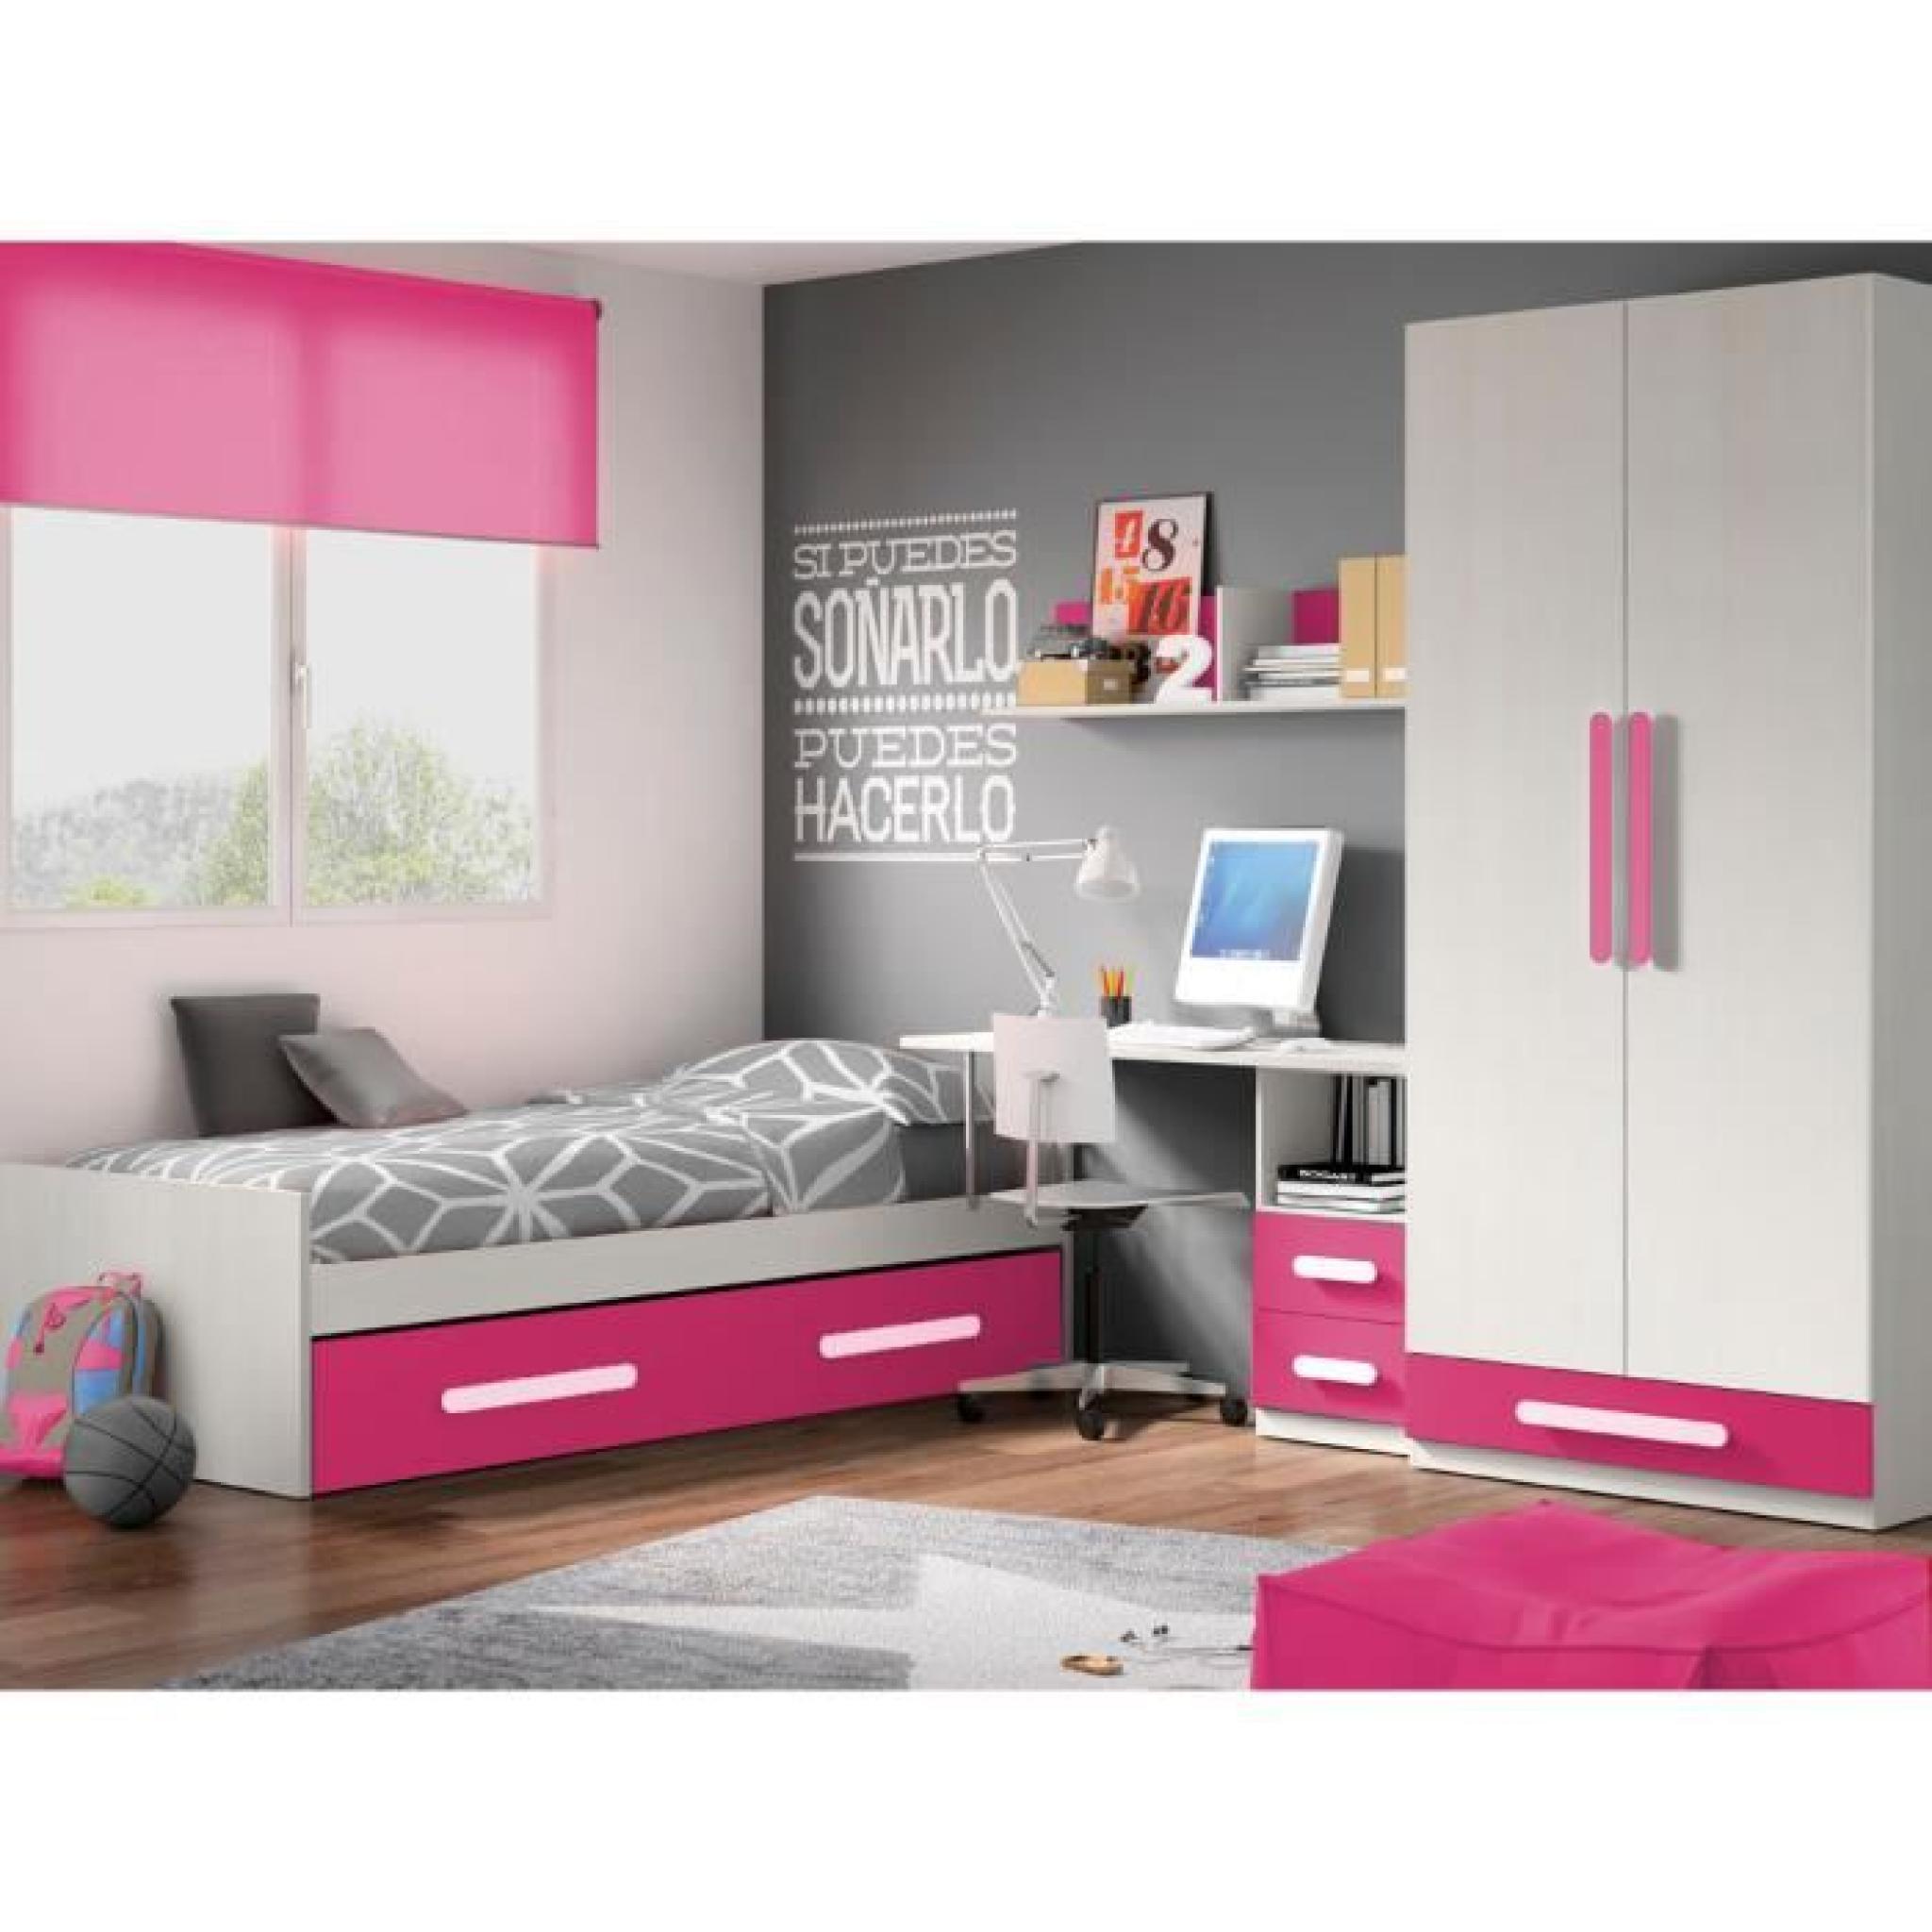 Chambre petite fille complete - Chambre rose et blanc ...